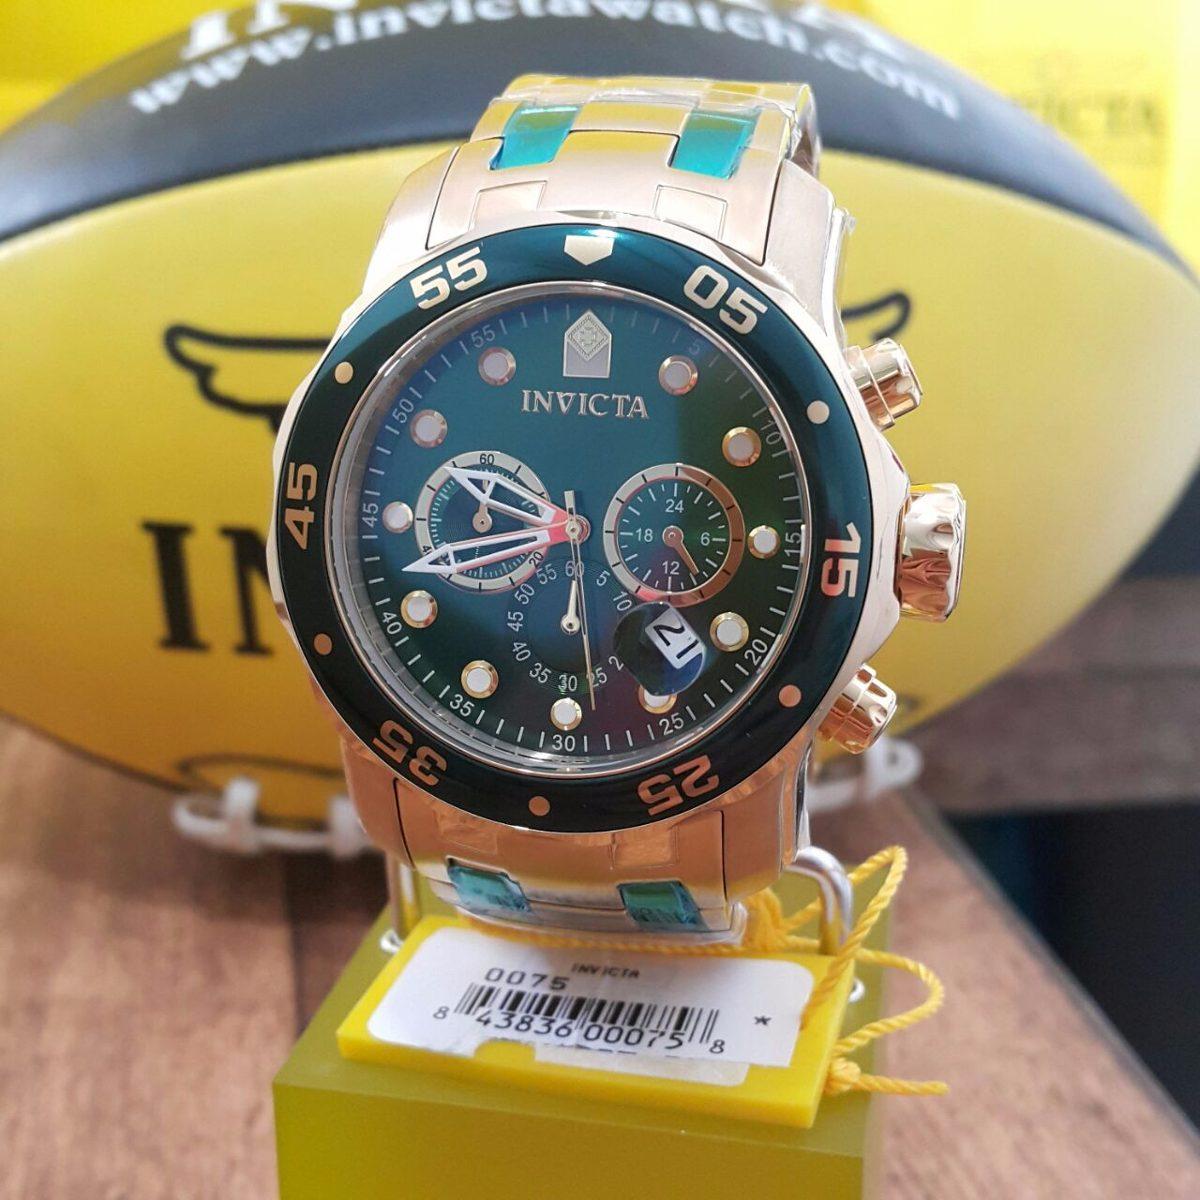 c4c00fd924b relógio invicta pro diver 0075 21925 ouro 18k dourado verde. Carregando  zoom.